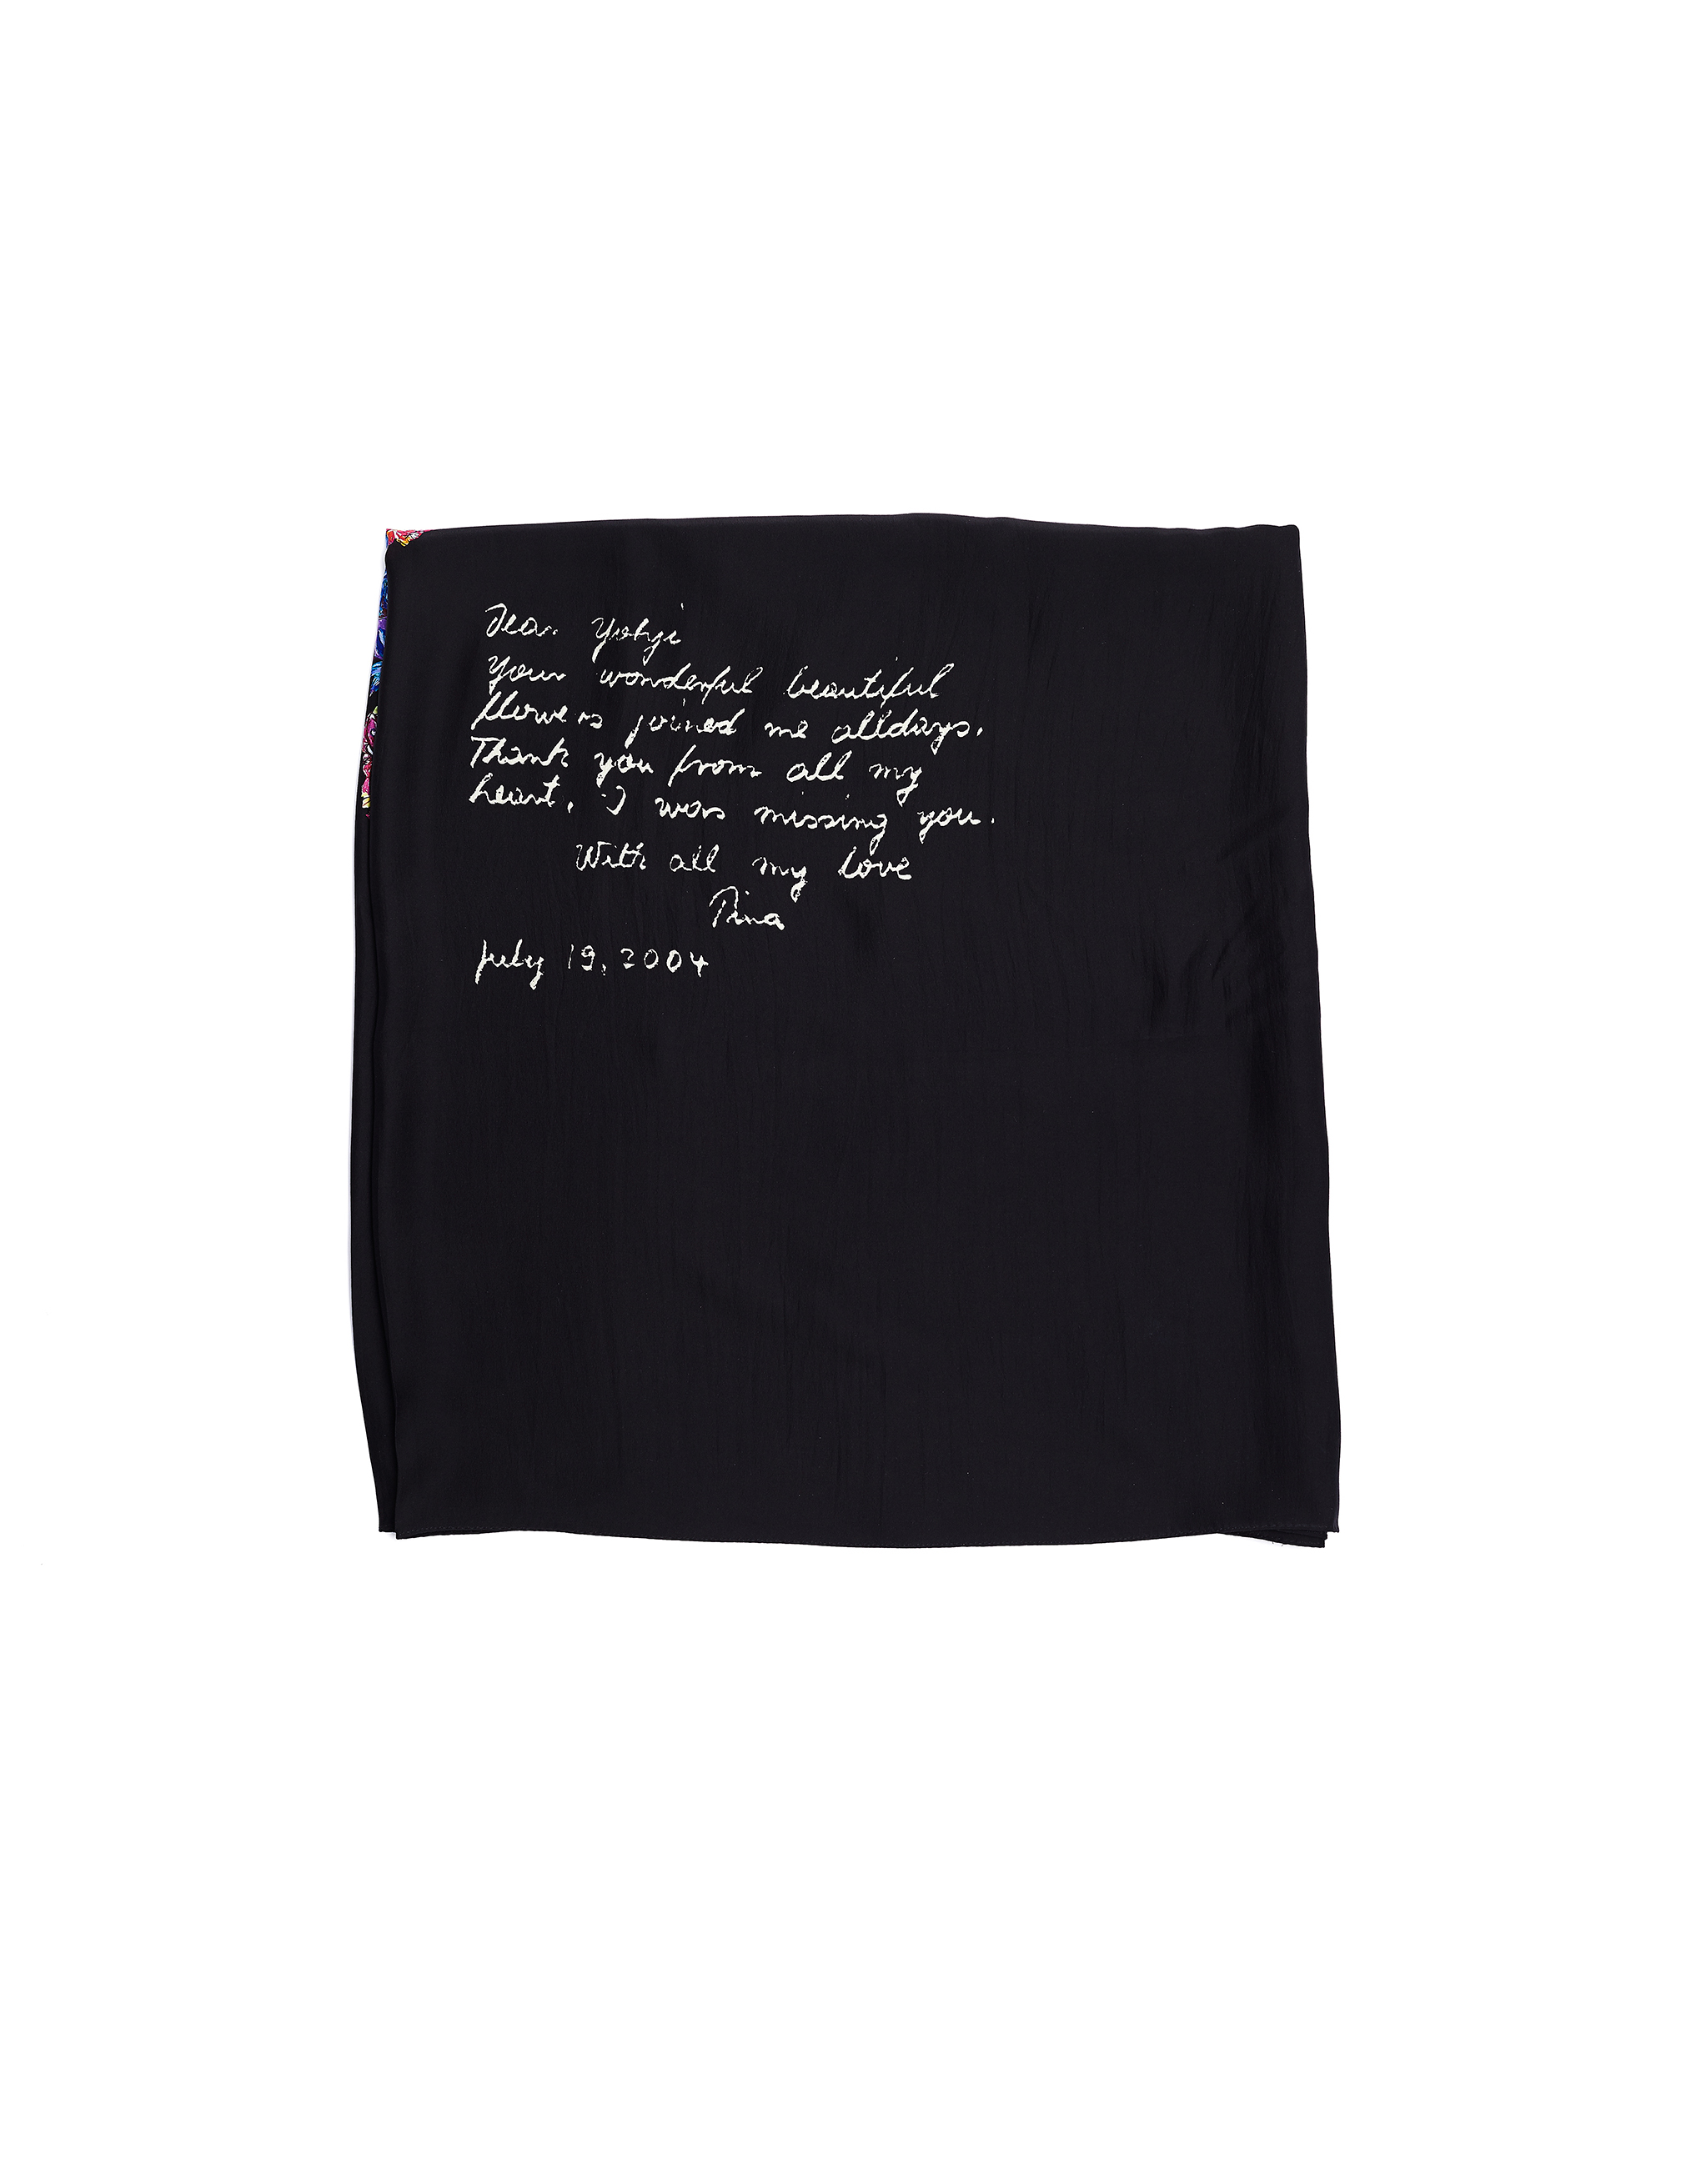 Yohji Yamamoto Black Sillk Flower Printed Scarf